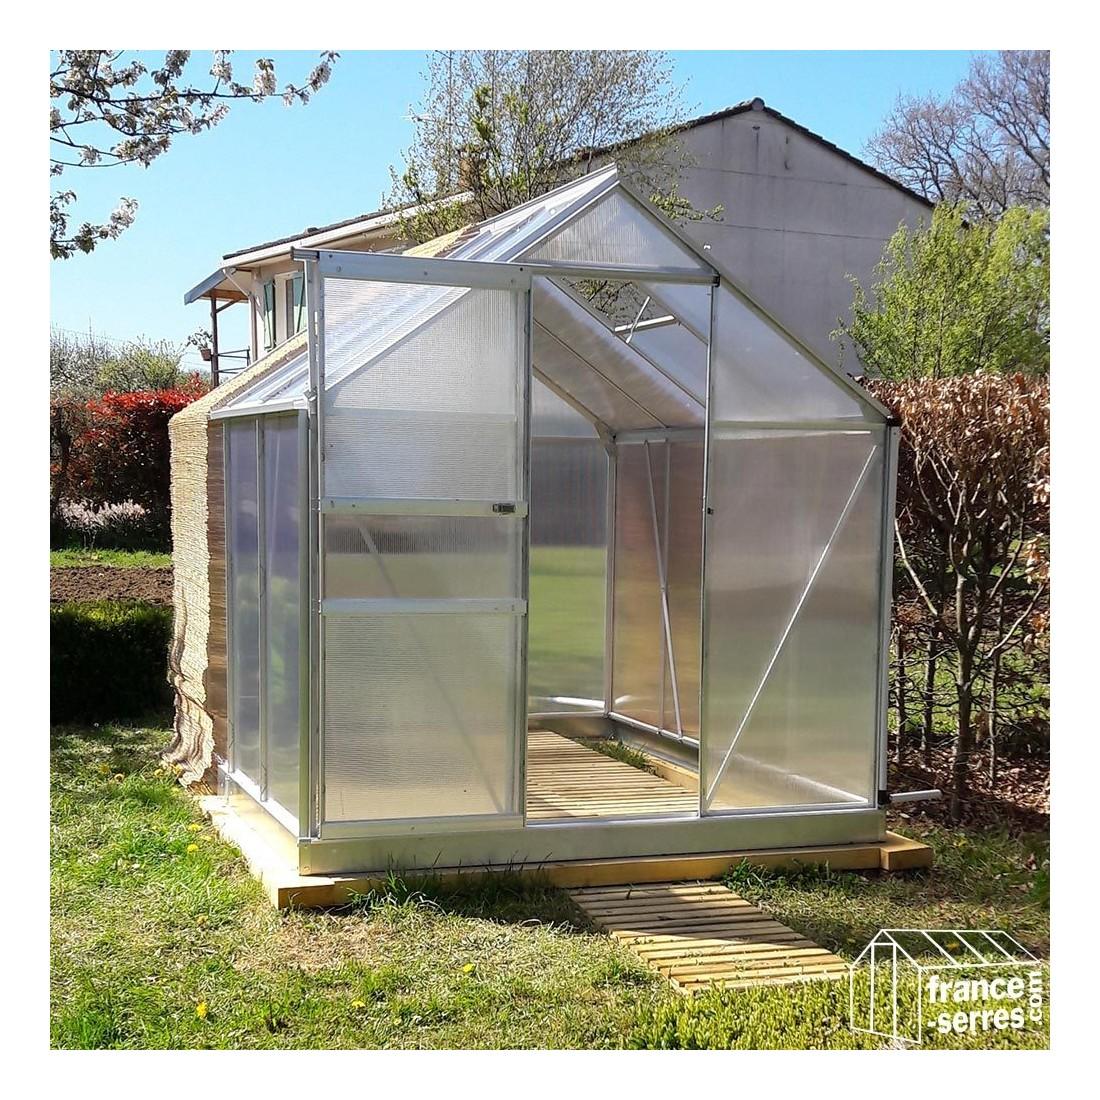 Serre de jardin en aluminium et polycarbonate alv olaire - Plaque polycarbonate pour serre jardin ...